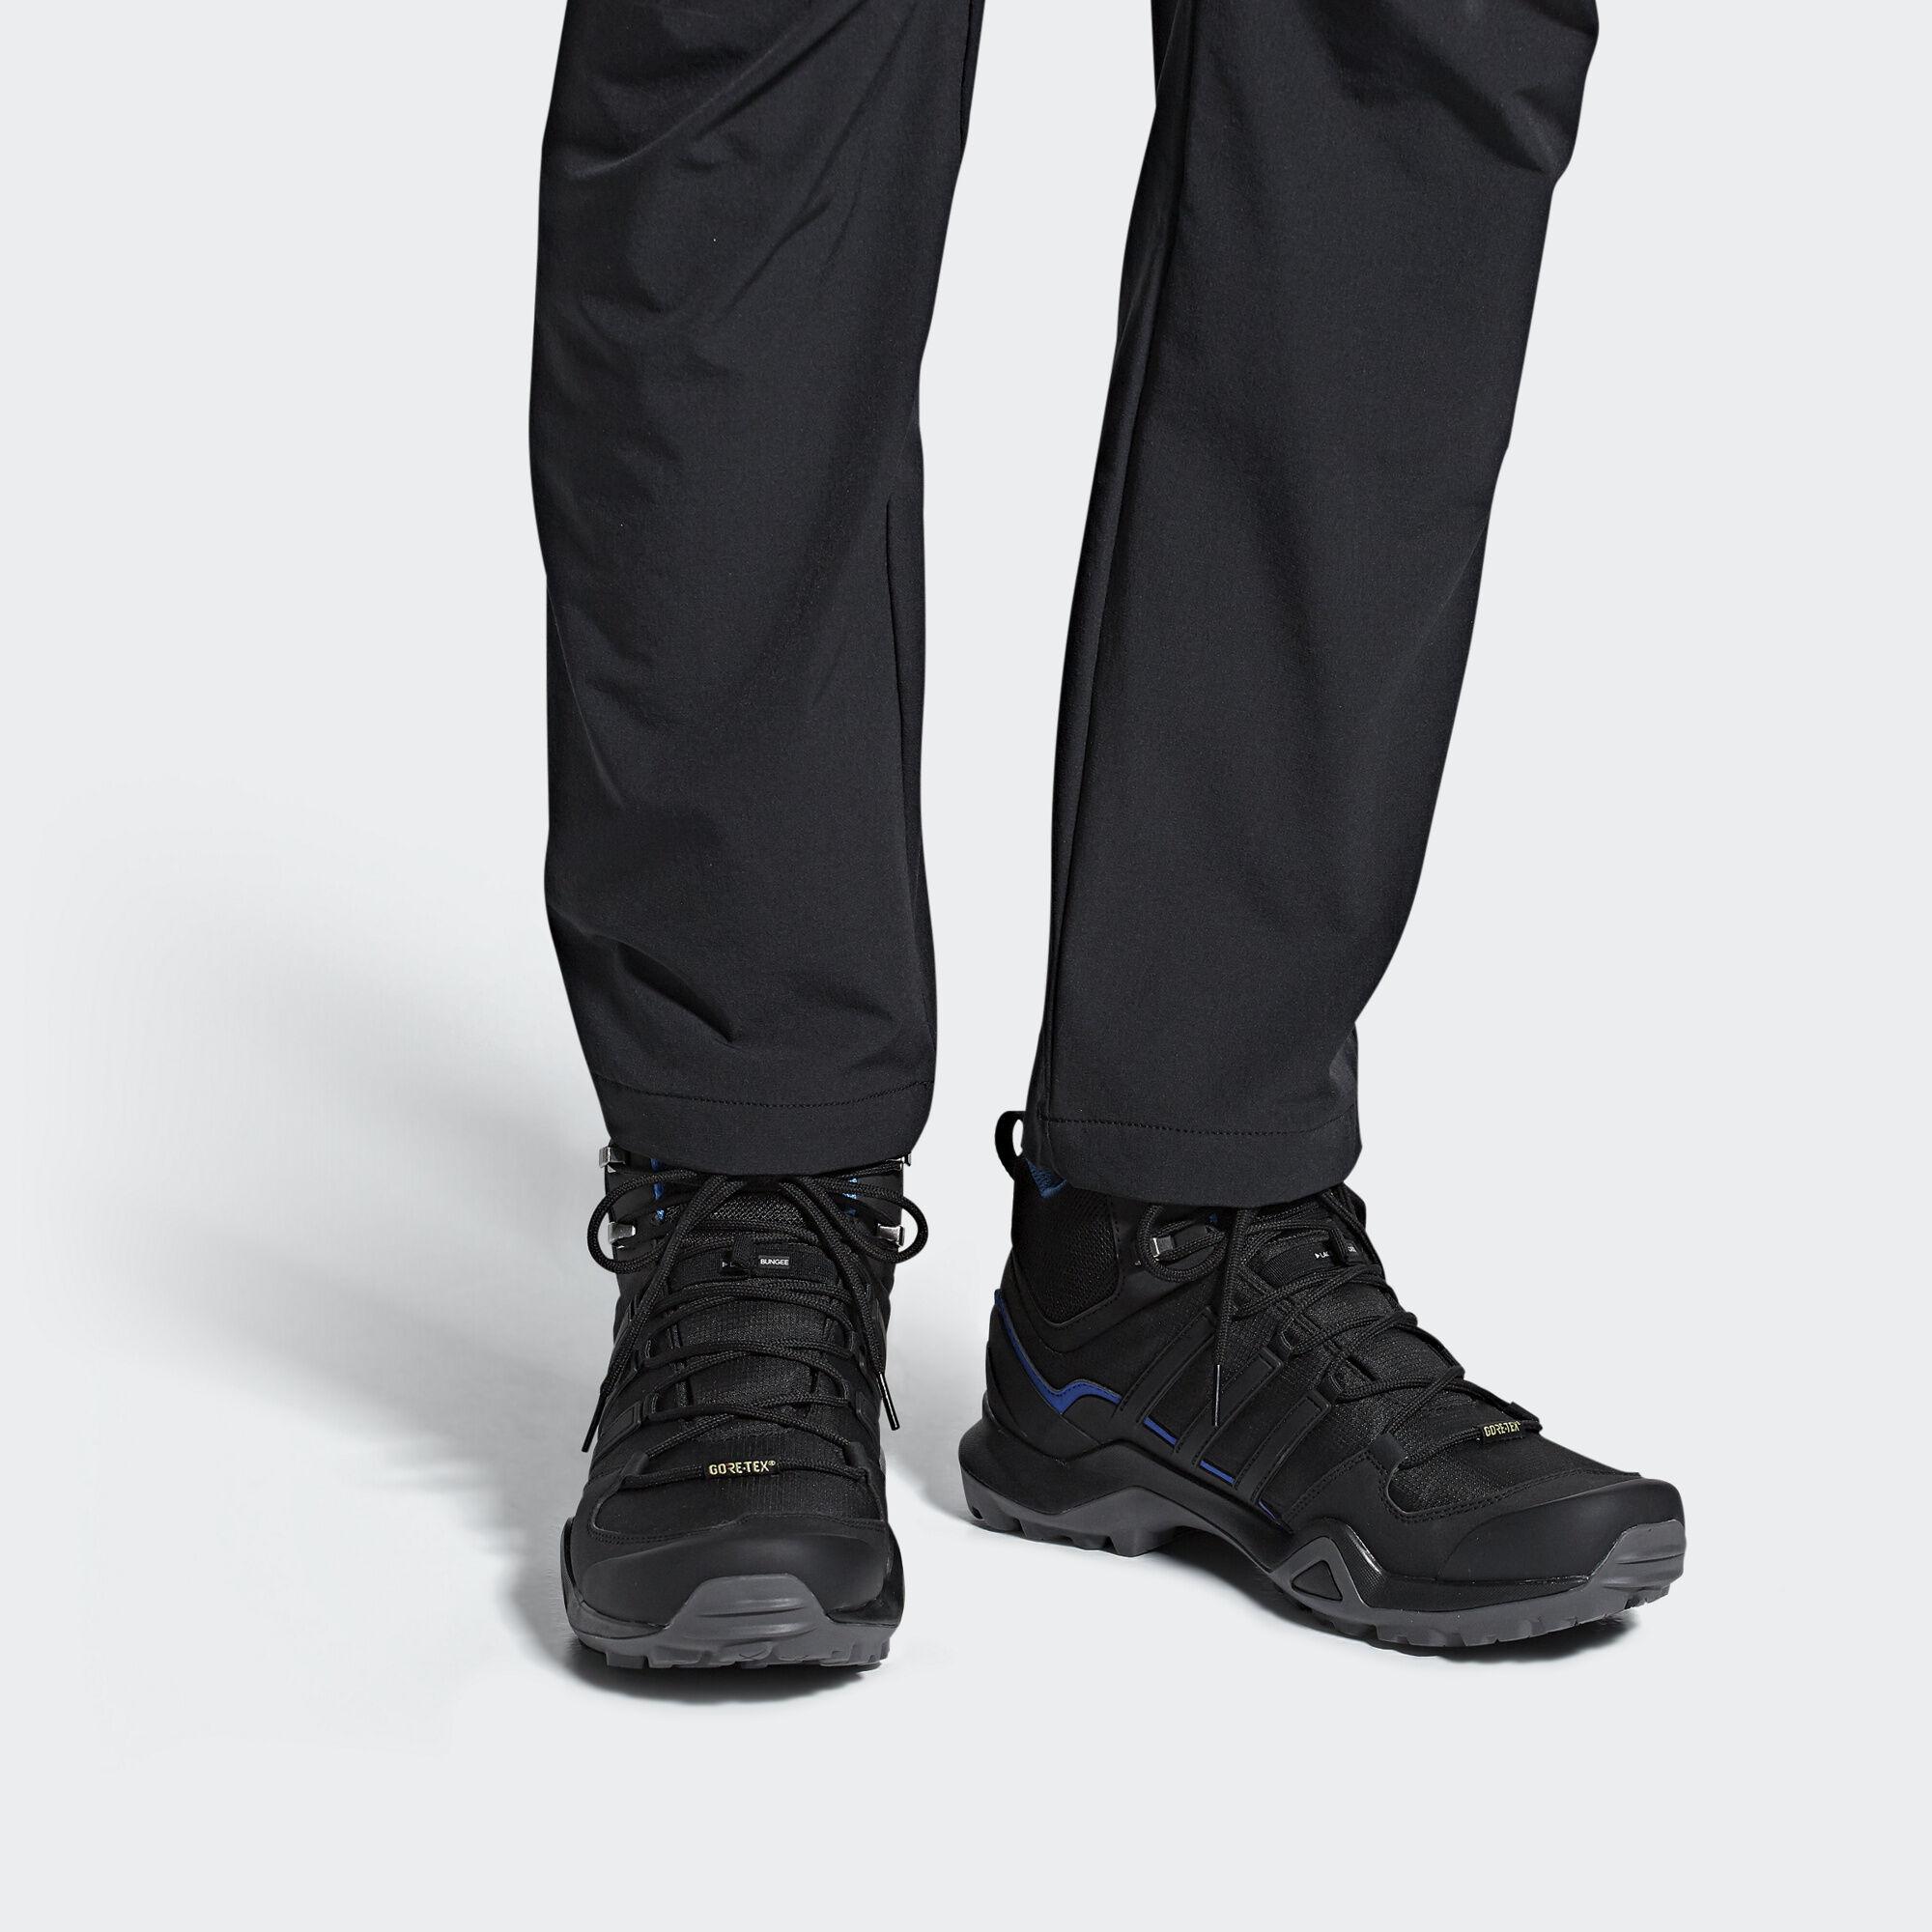 7be151b08d8 adidas Terrex Swift R2 Mid GTX Shoes - Black